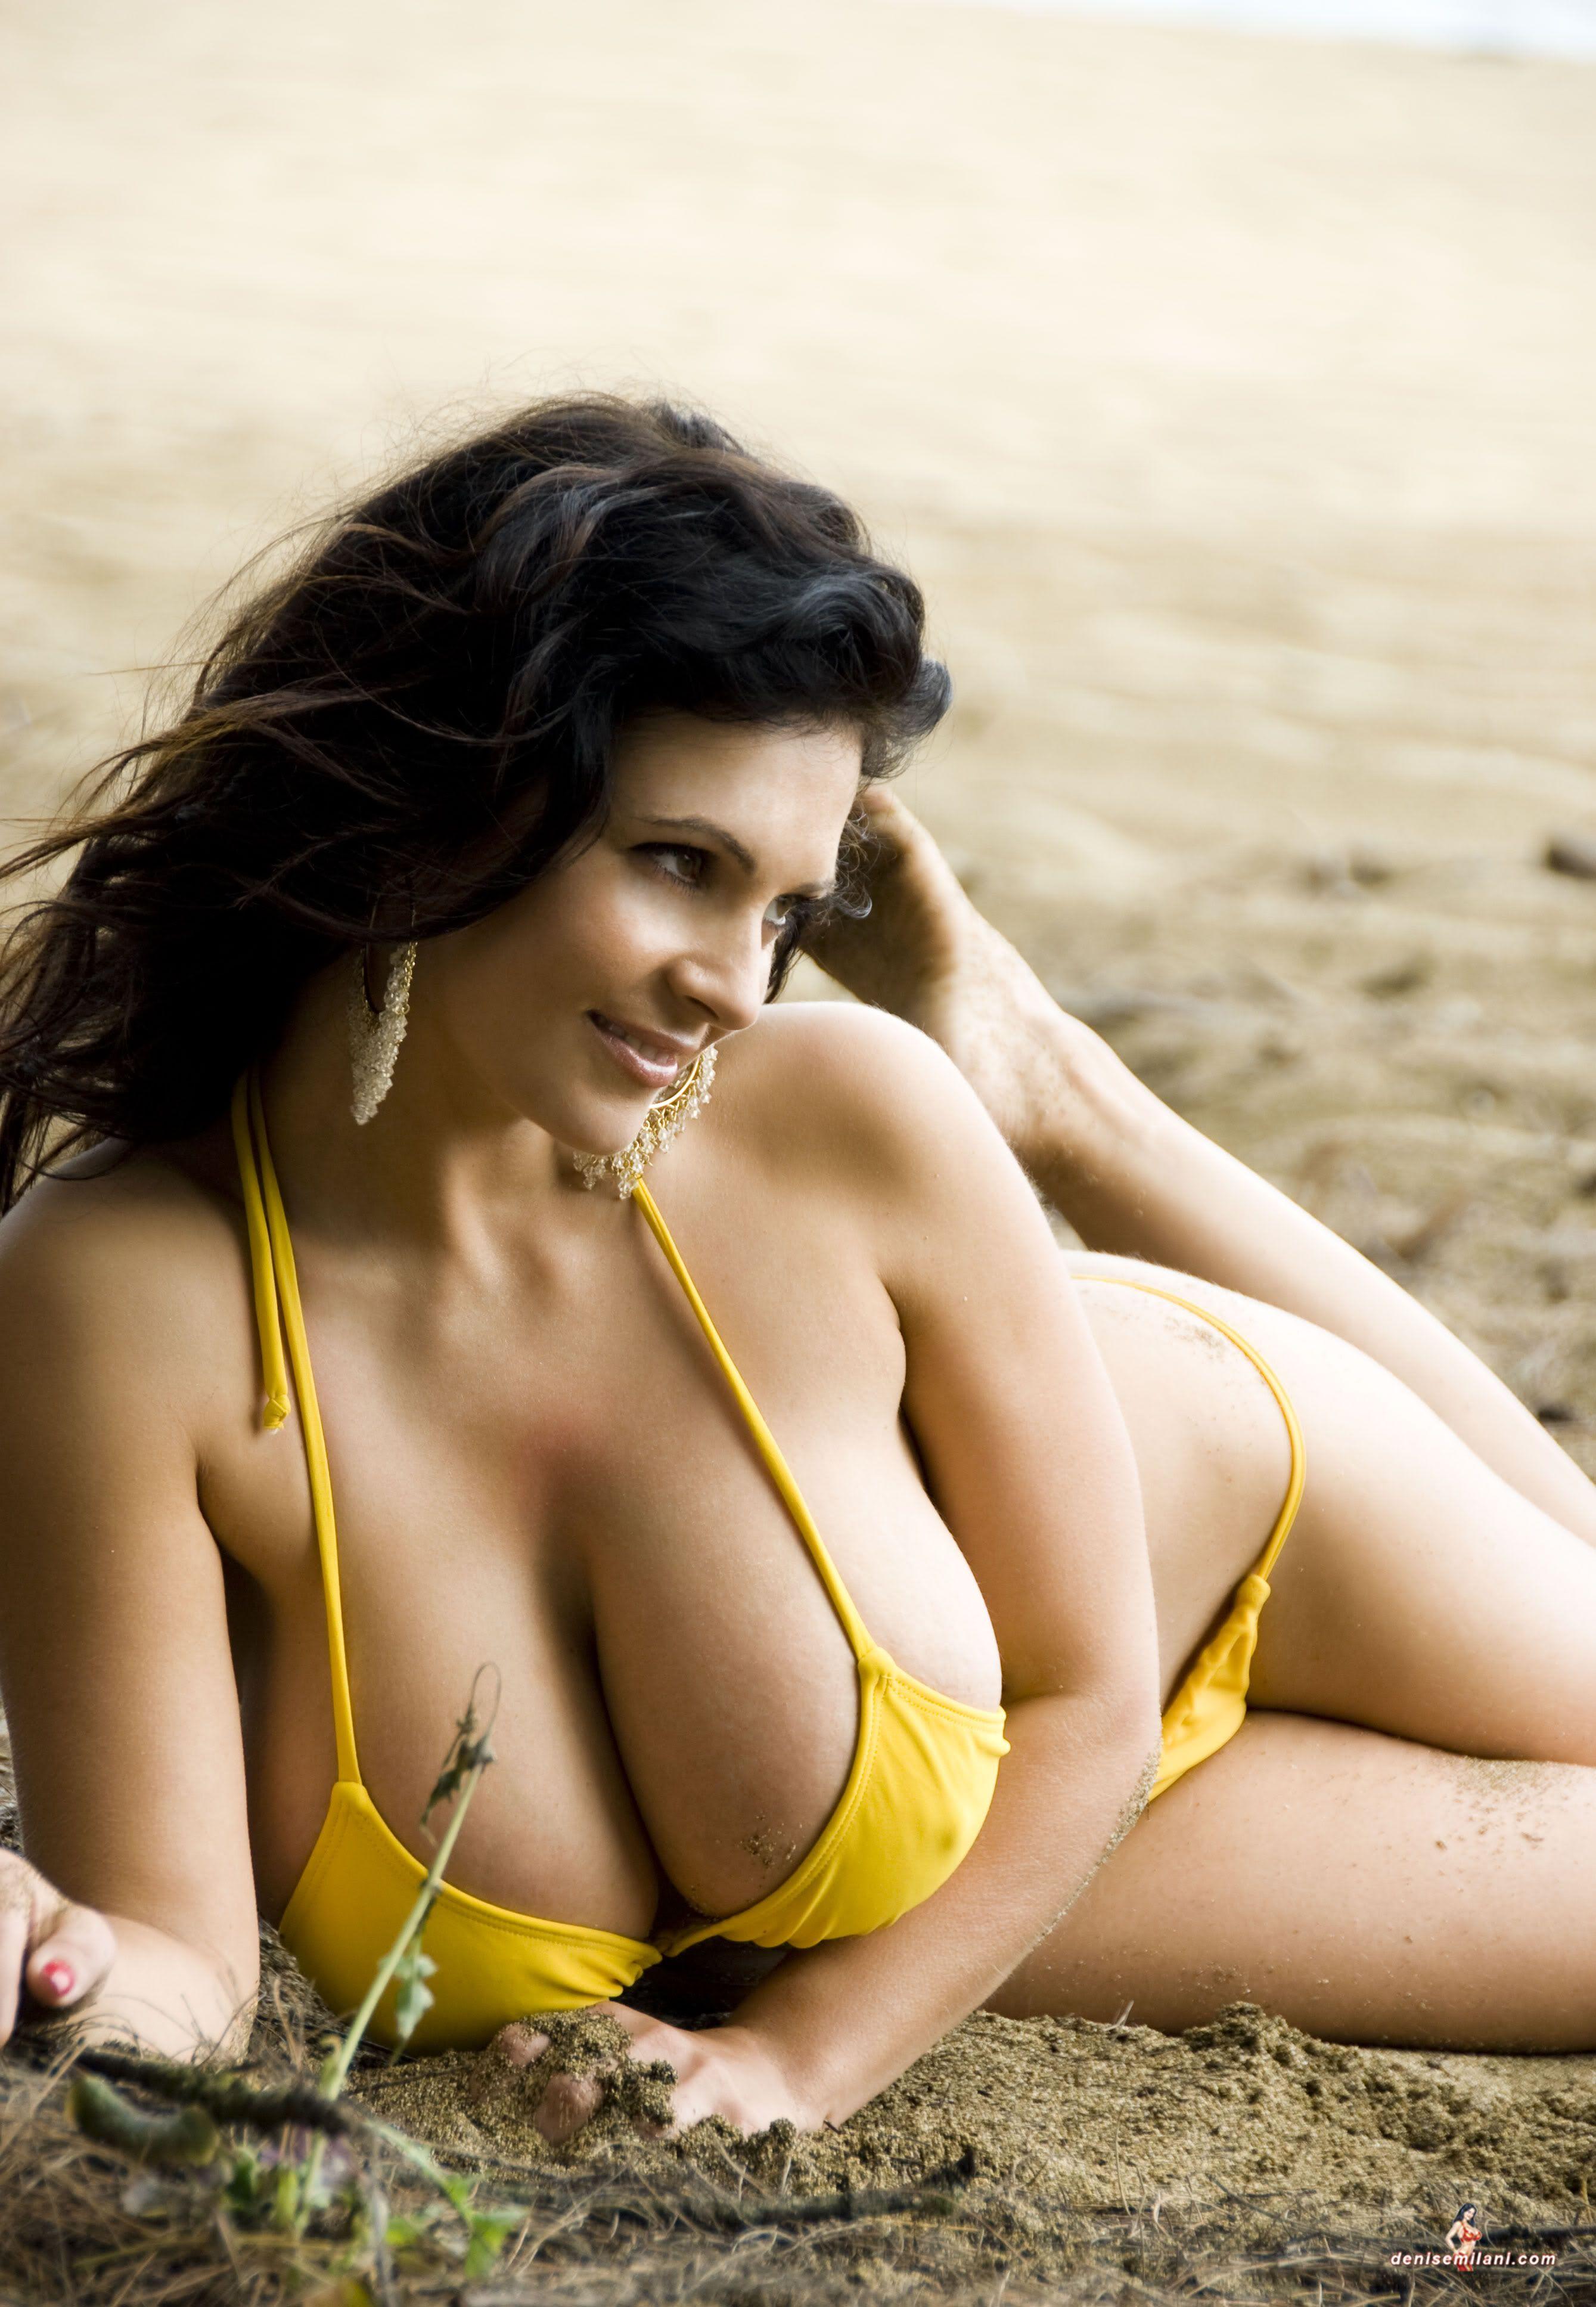 Babe brazilian porn